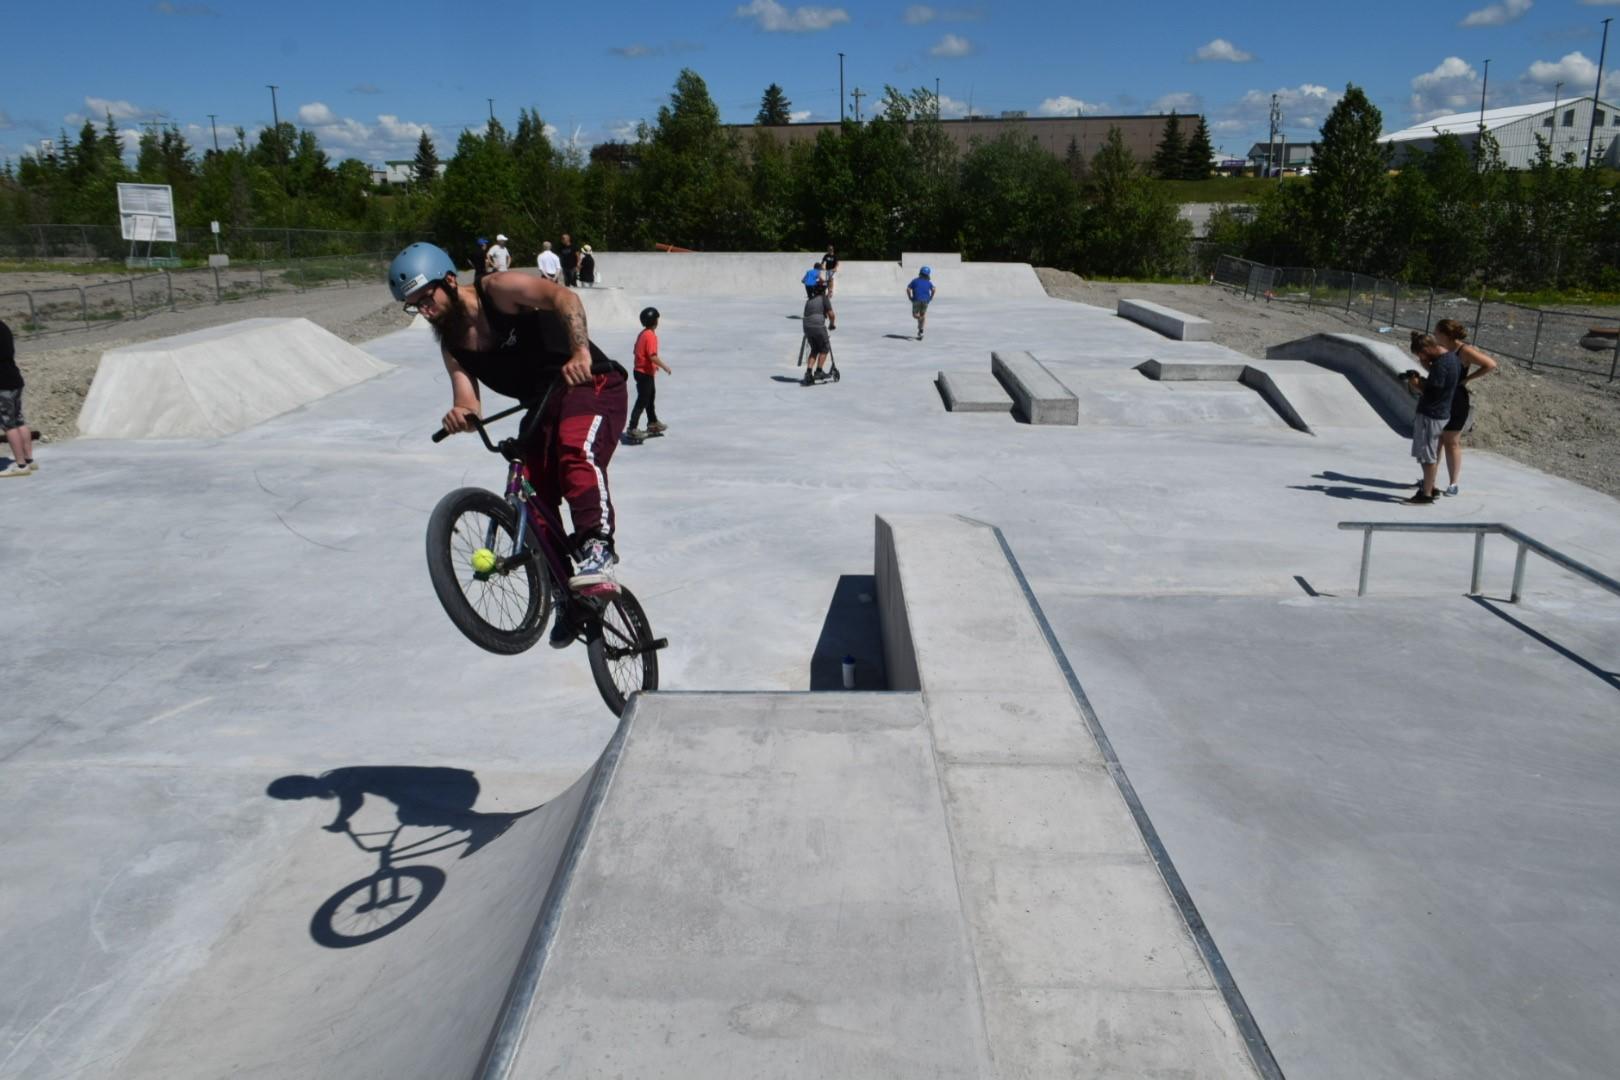 Skate Park Amos